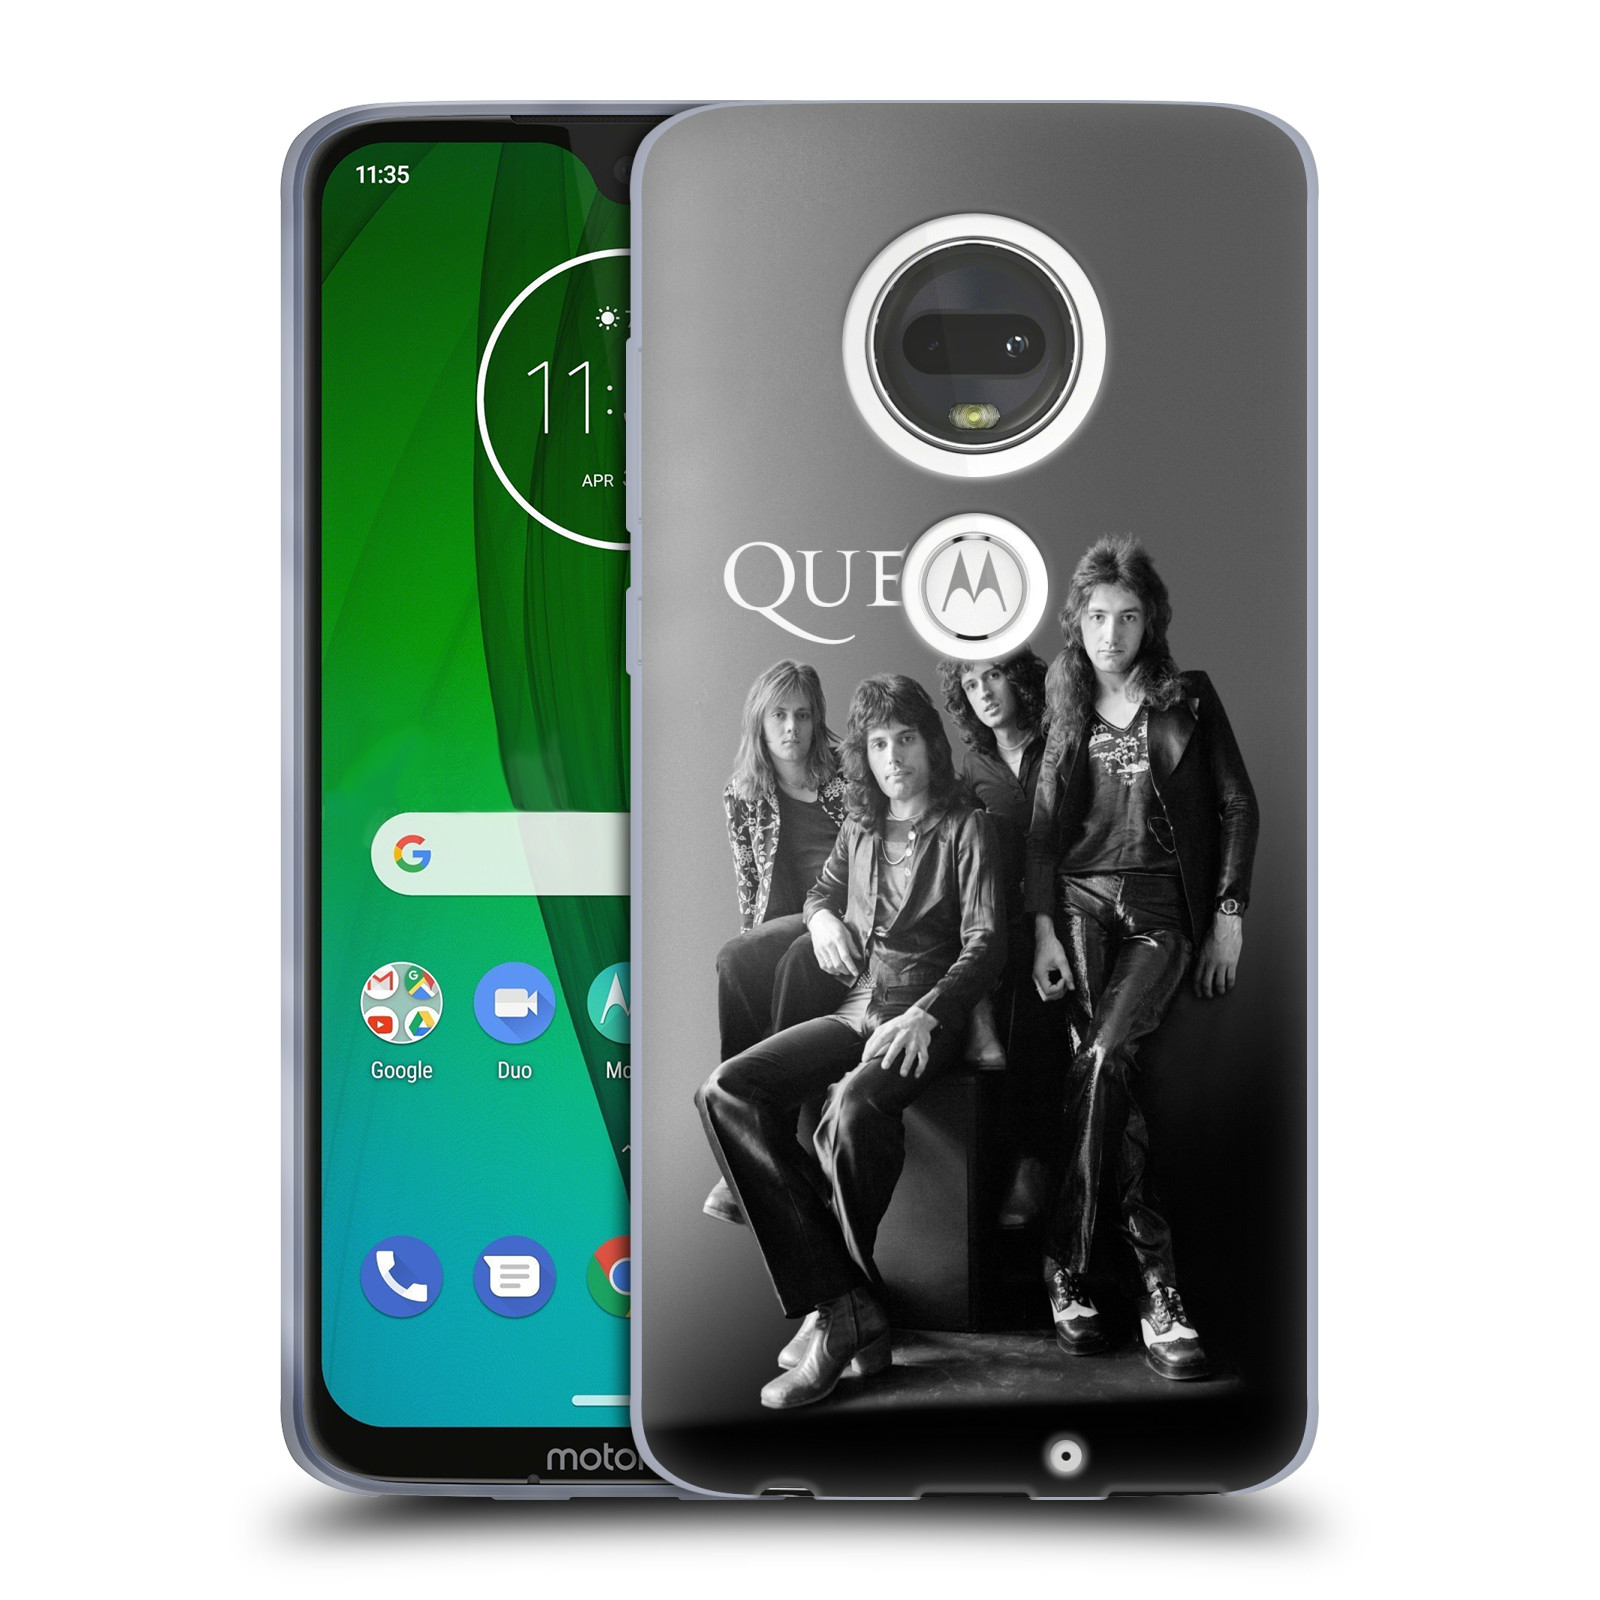 Silikonové pouzdro na mobil Motorola Moto G7 - Head Case - Queen - Skupina